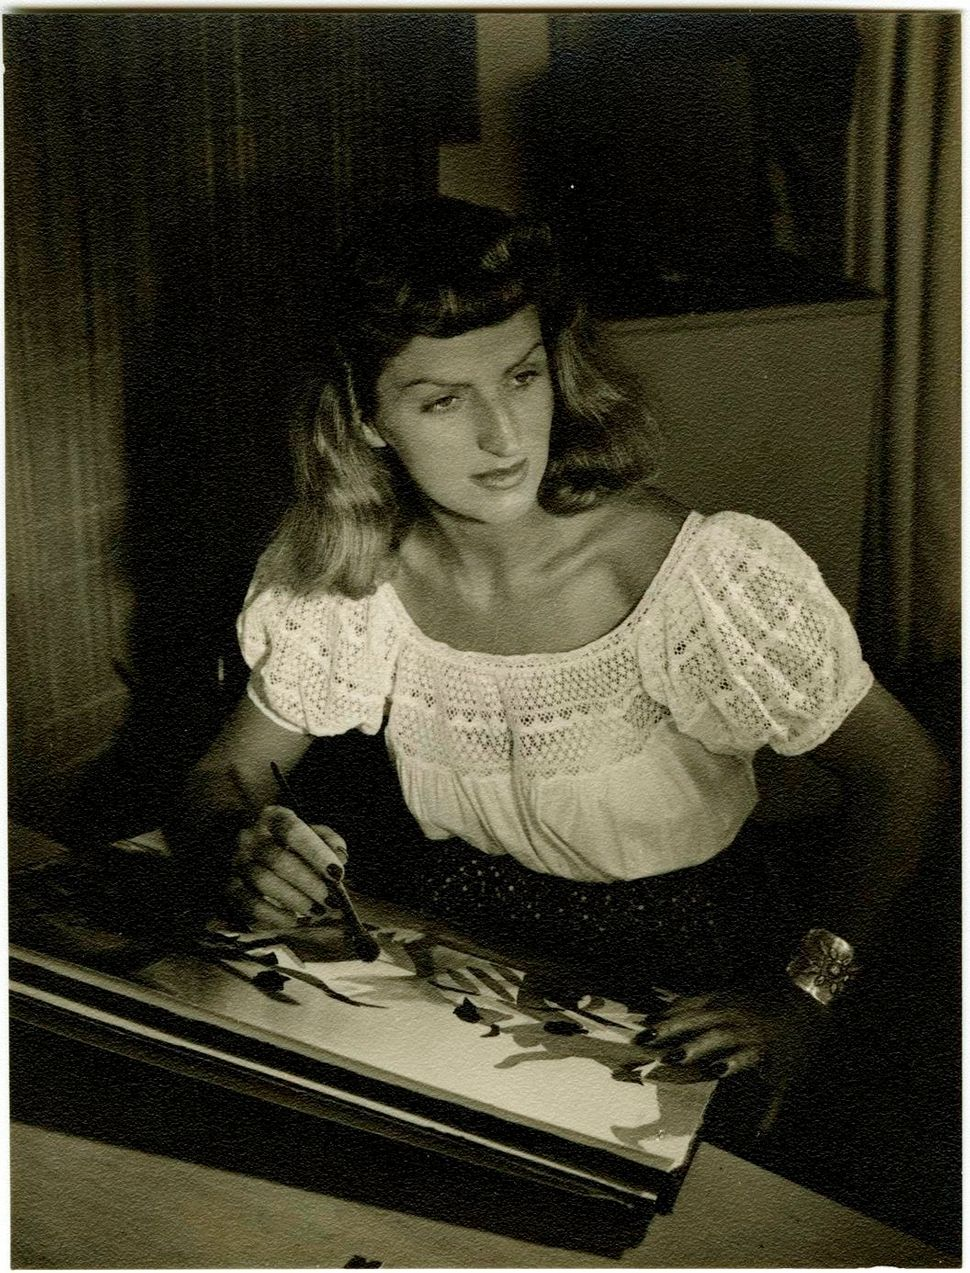 Mary Blair portrait, ca. 1941; Walt Disney Family Foundation, Gift of Jeanne Chamberlain and Maggie Richardson